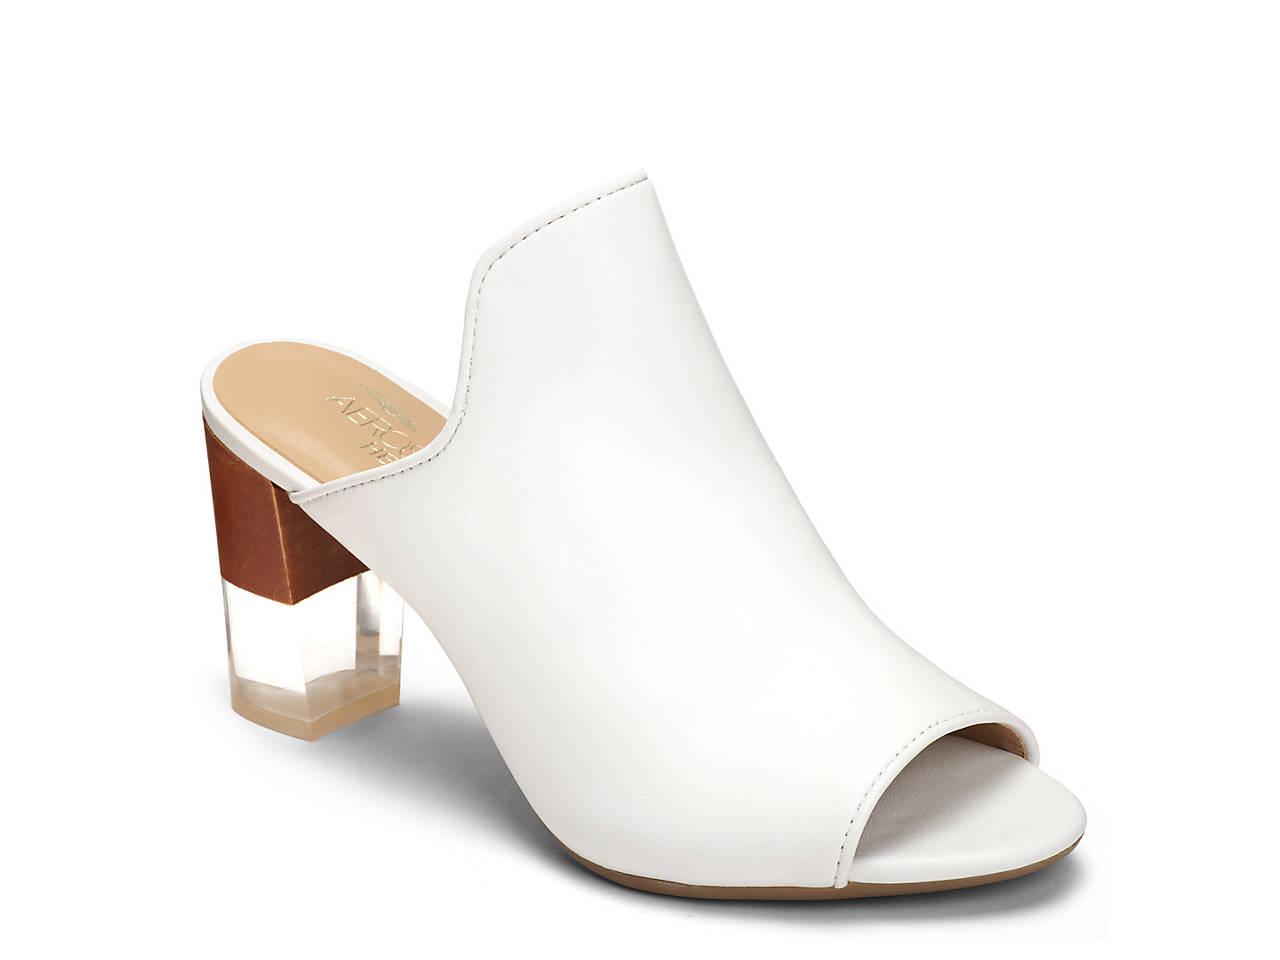 953974c3b2a3 Aerosoles Birdwatcher Sandal Women s Shoes